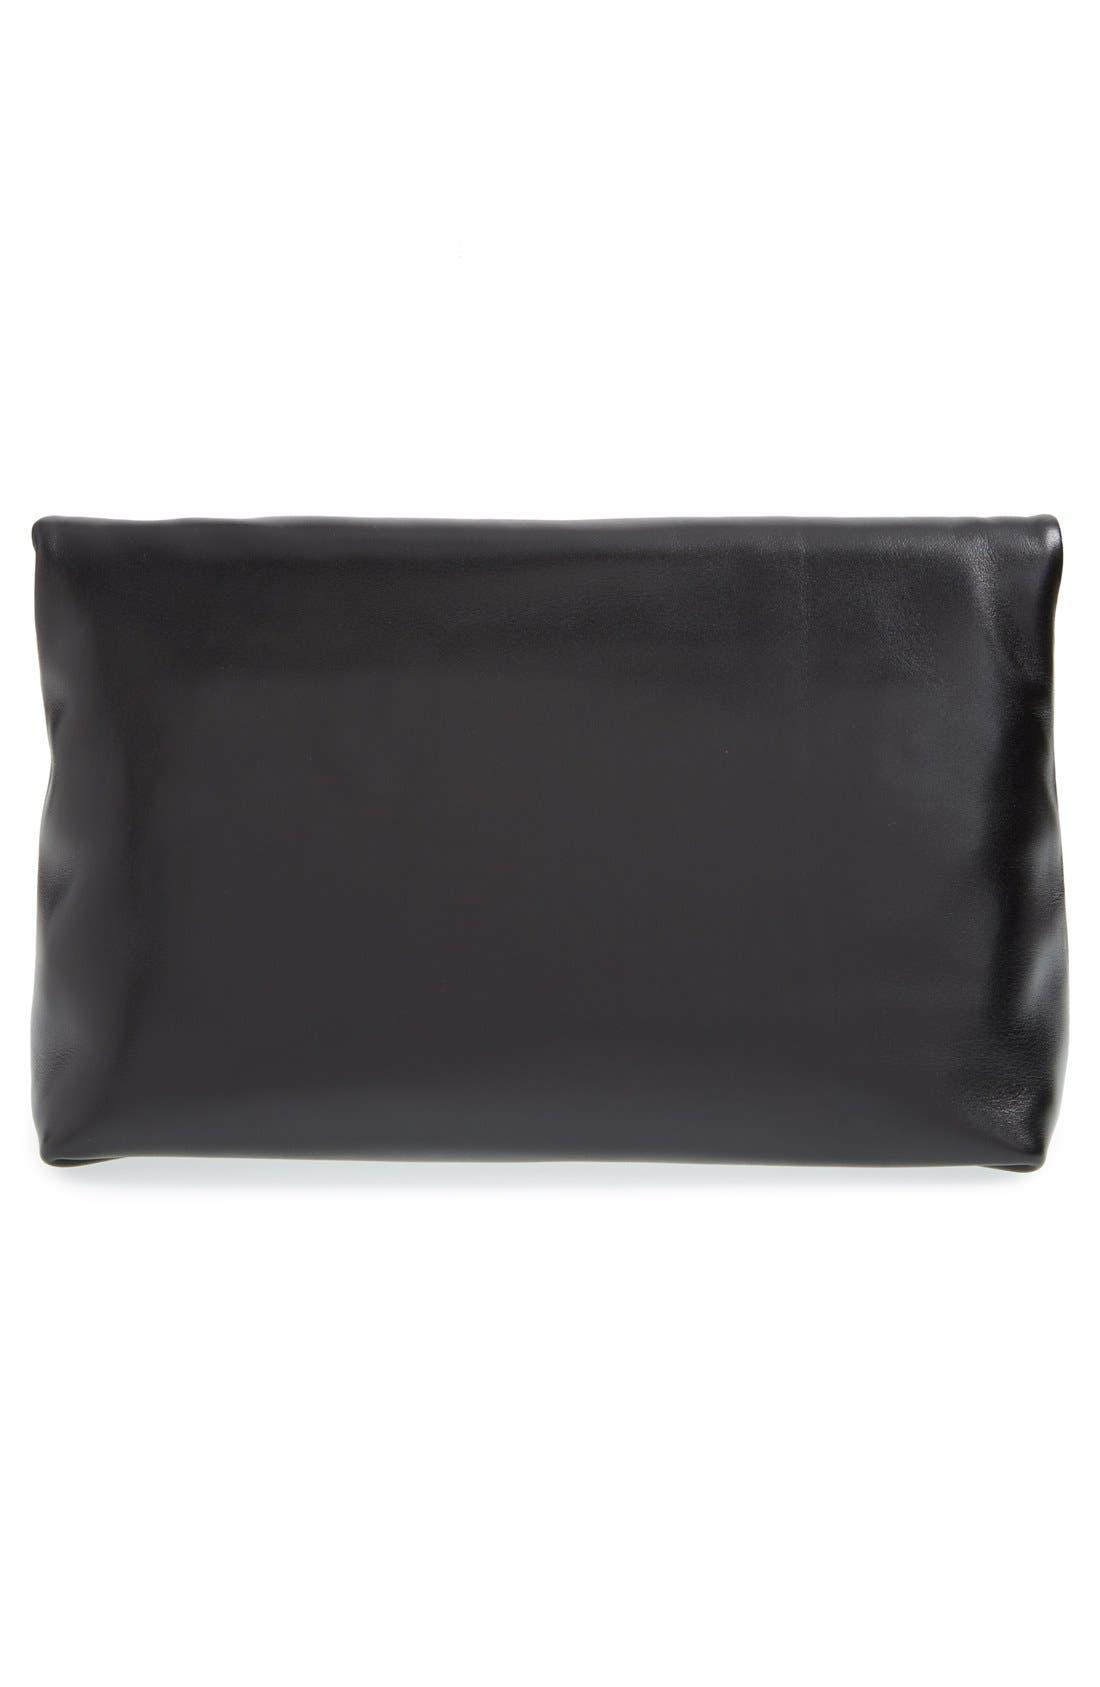 Alternate Image 4  - MICHAEL Michael Kors 'Daria' Leather Foldover Clutch